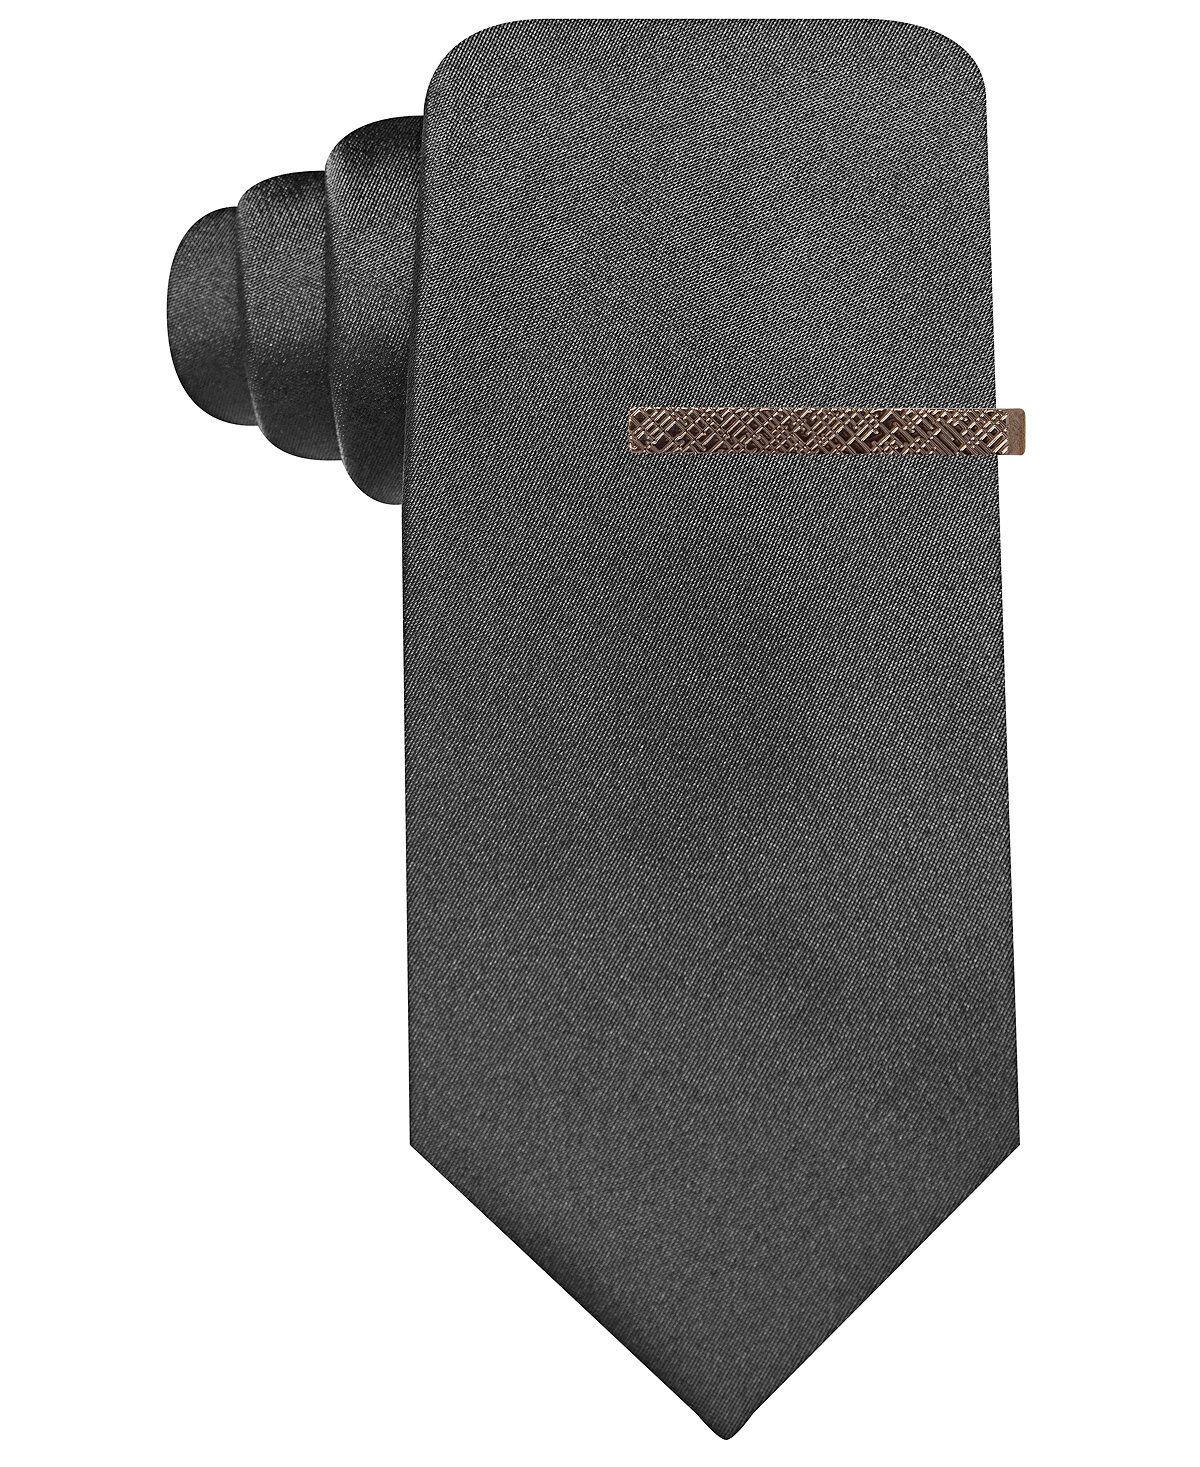 ryan seacrest mens silk solid black neck tie classic skinny necktie